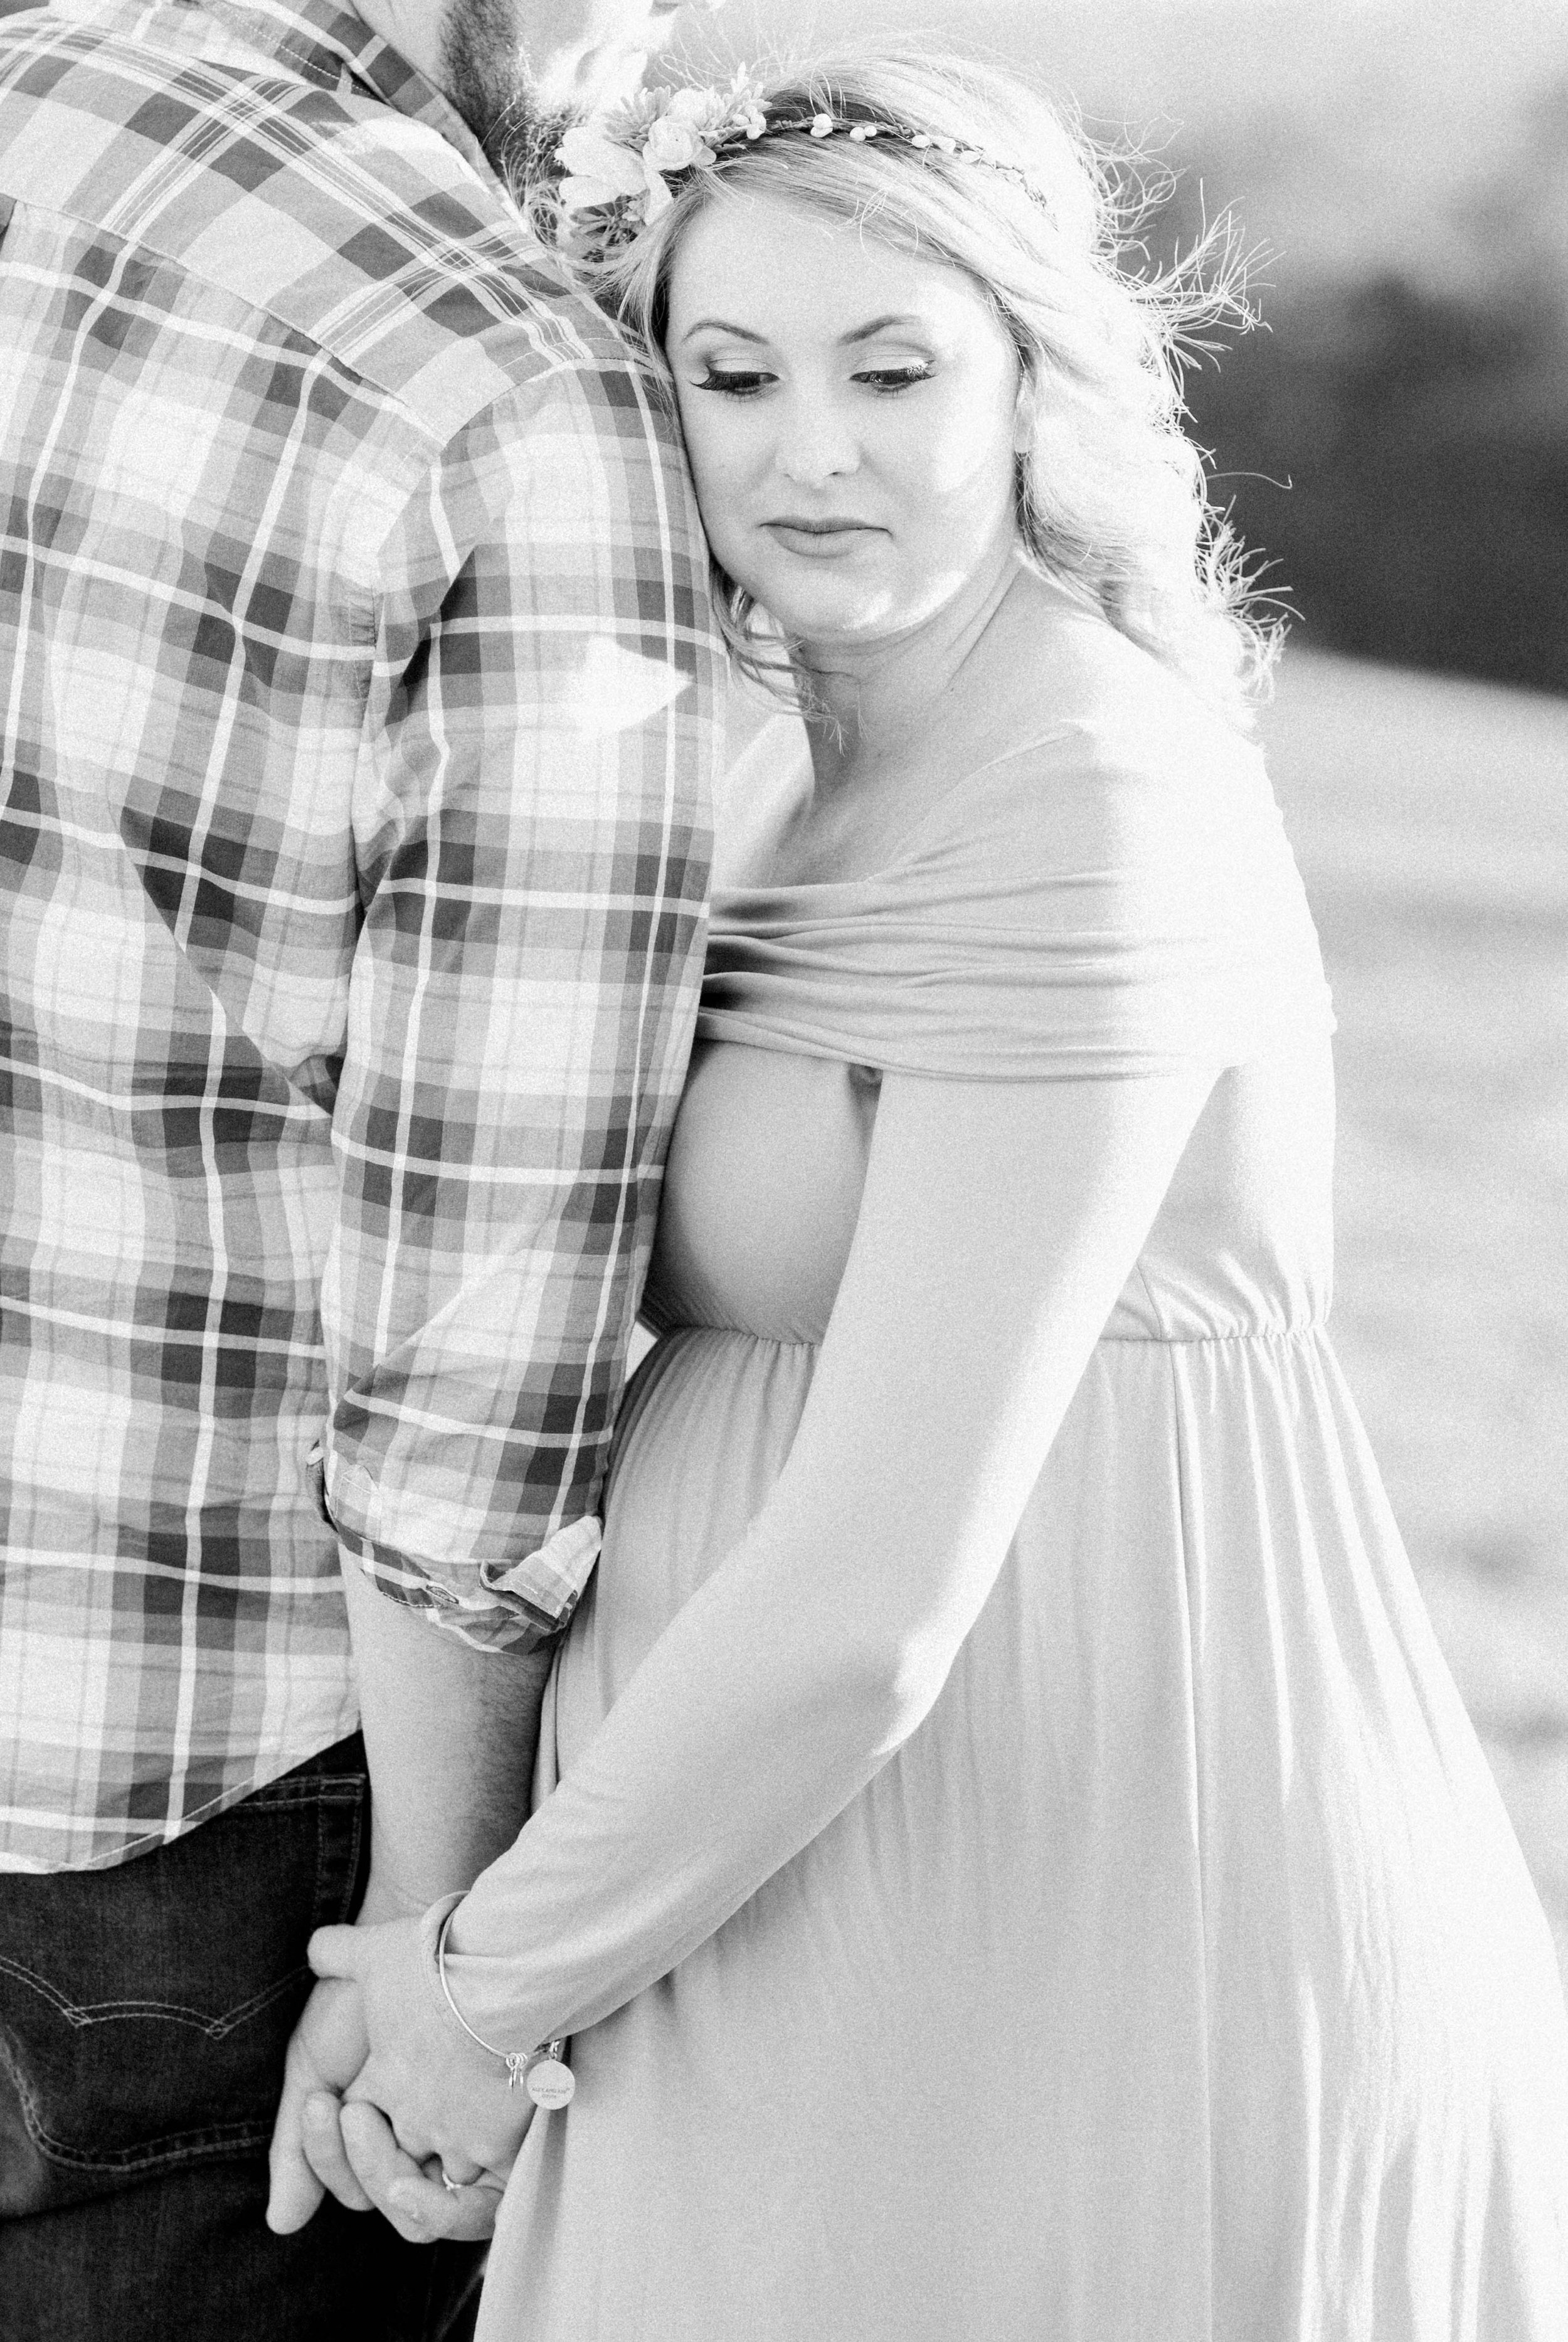 SorellaFarms_Jessica+Dylan_MaternitySession_Virginiaweddingphotographer 25.jpg